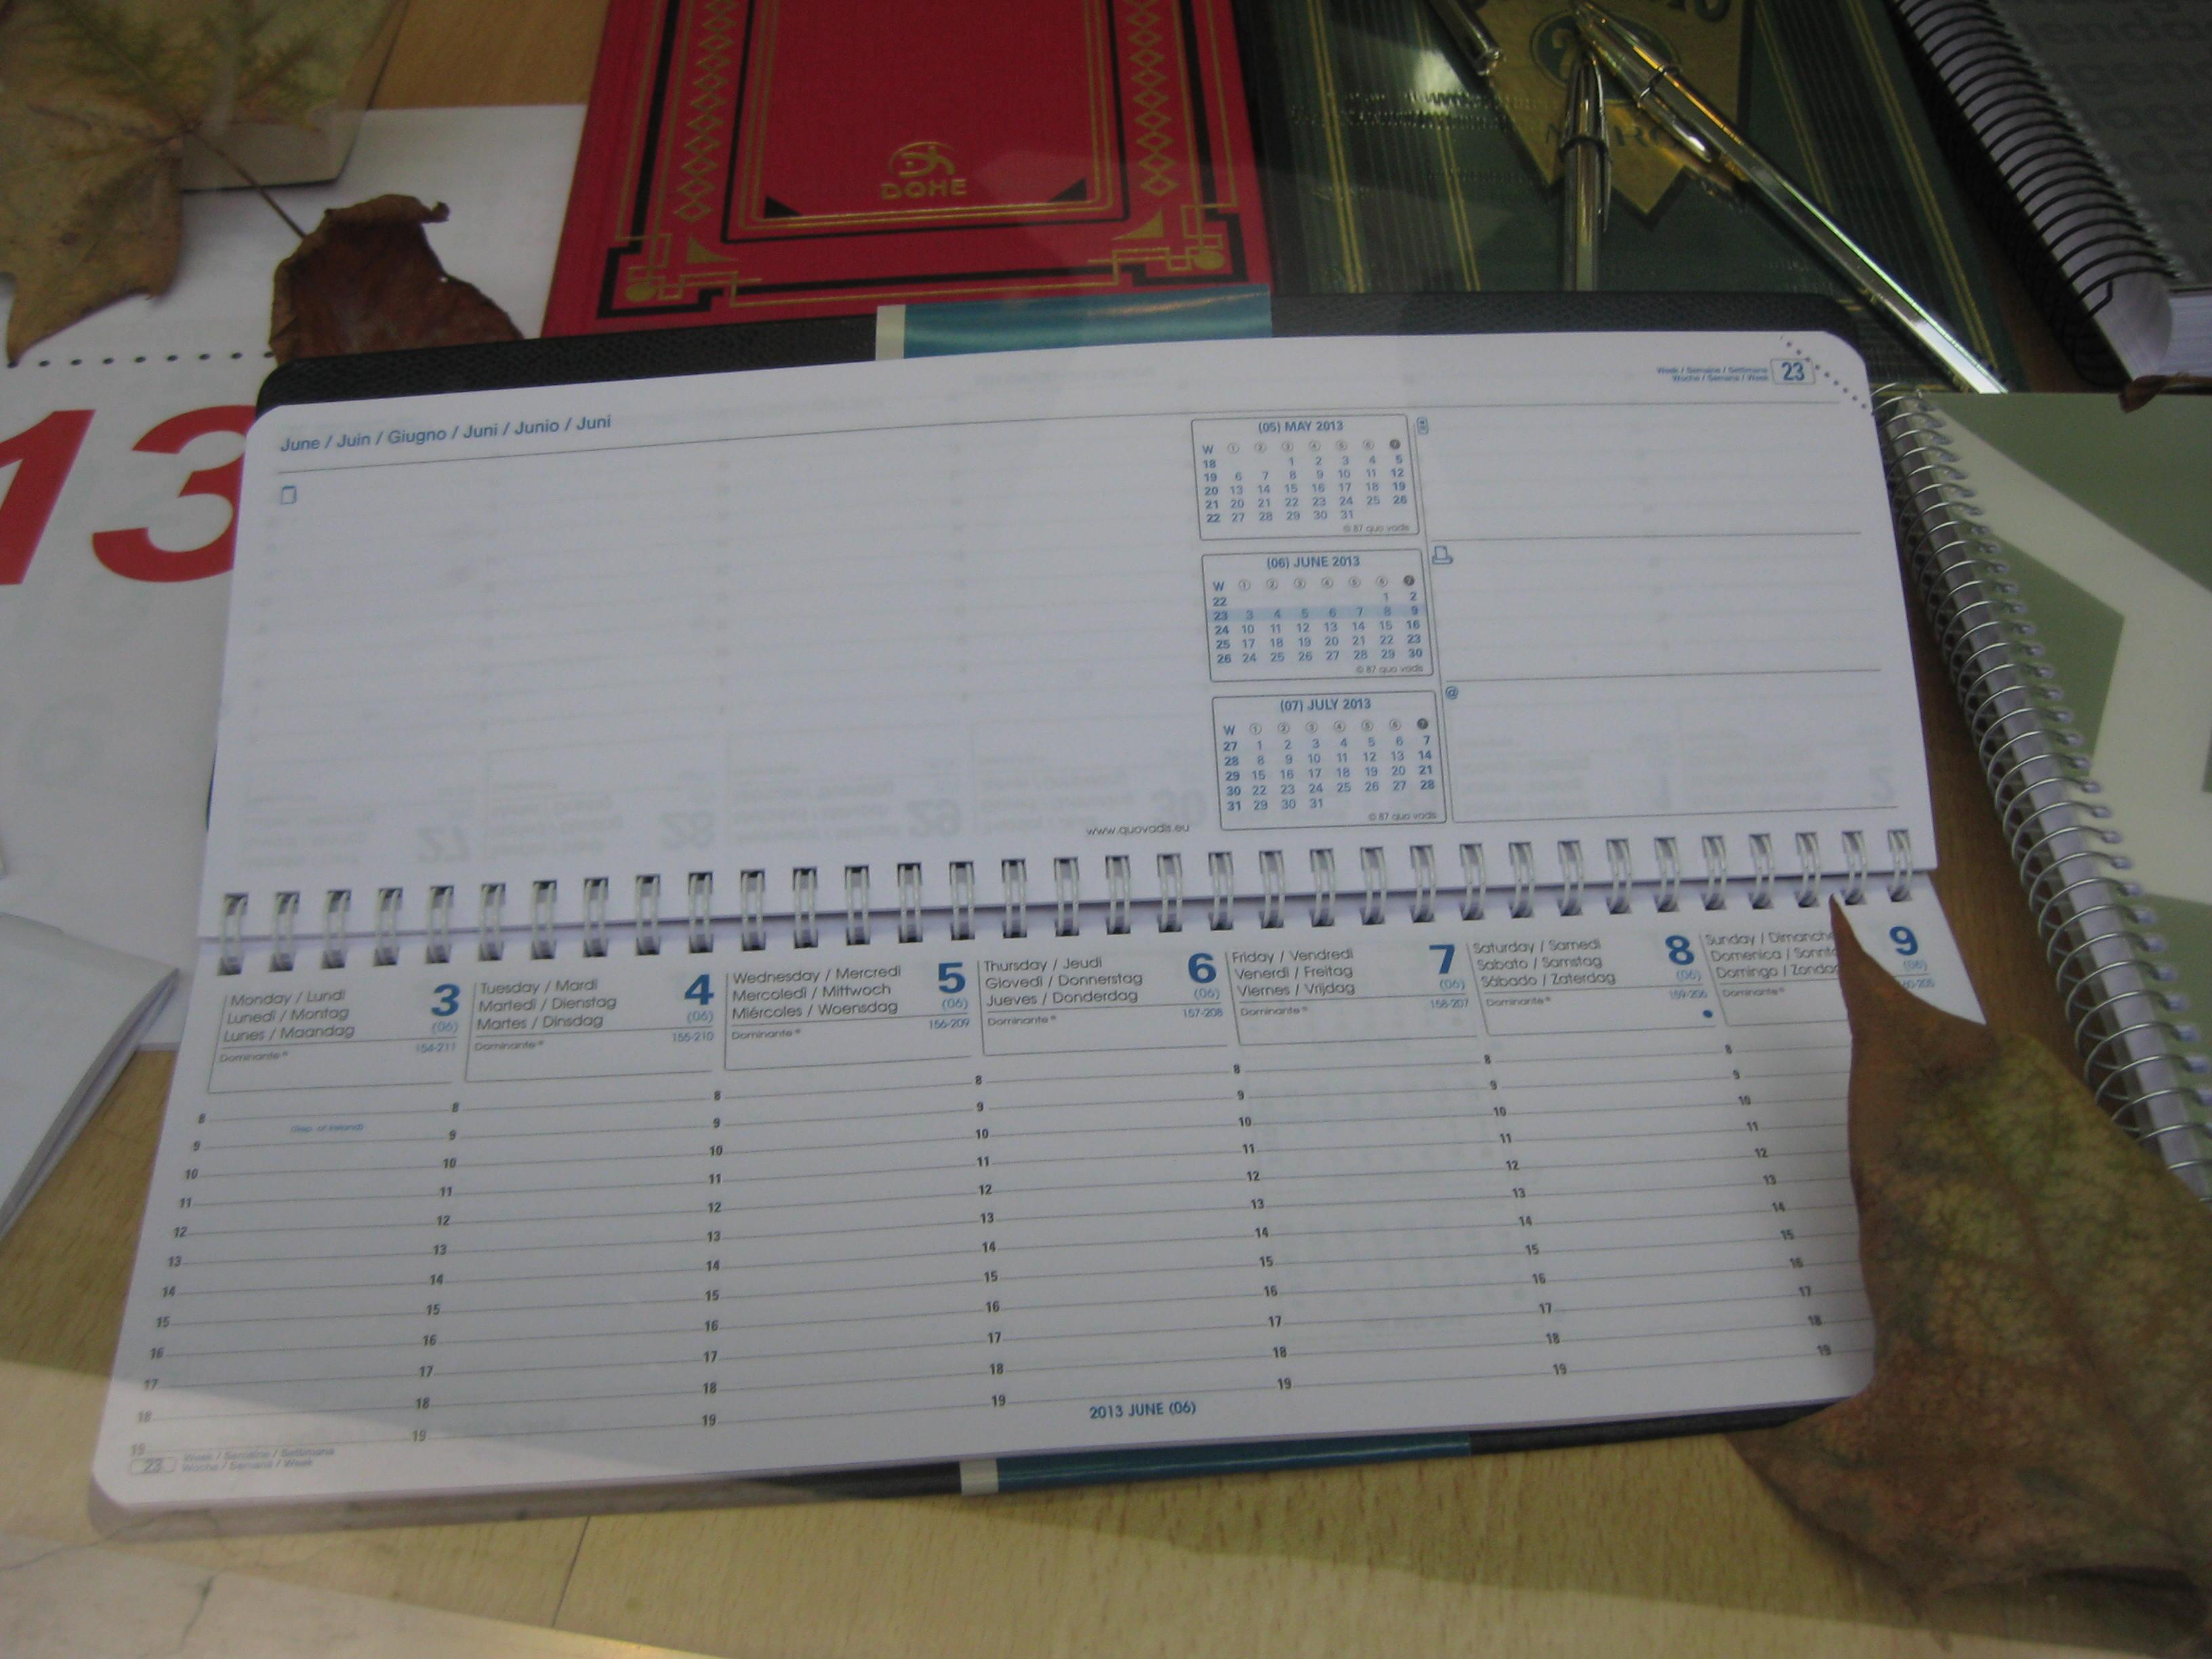 Agenda 2013 bis